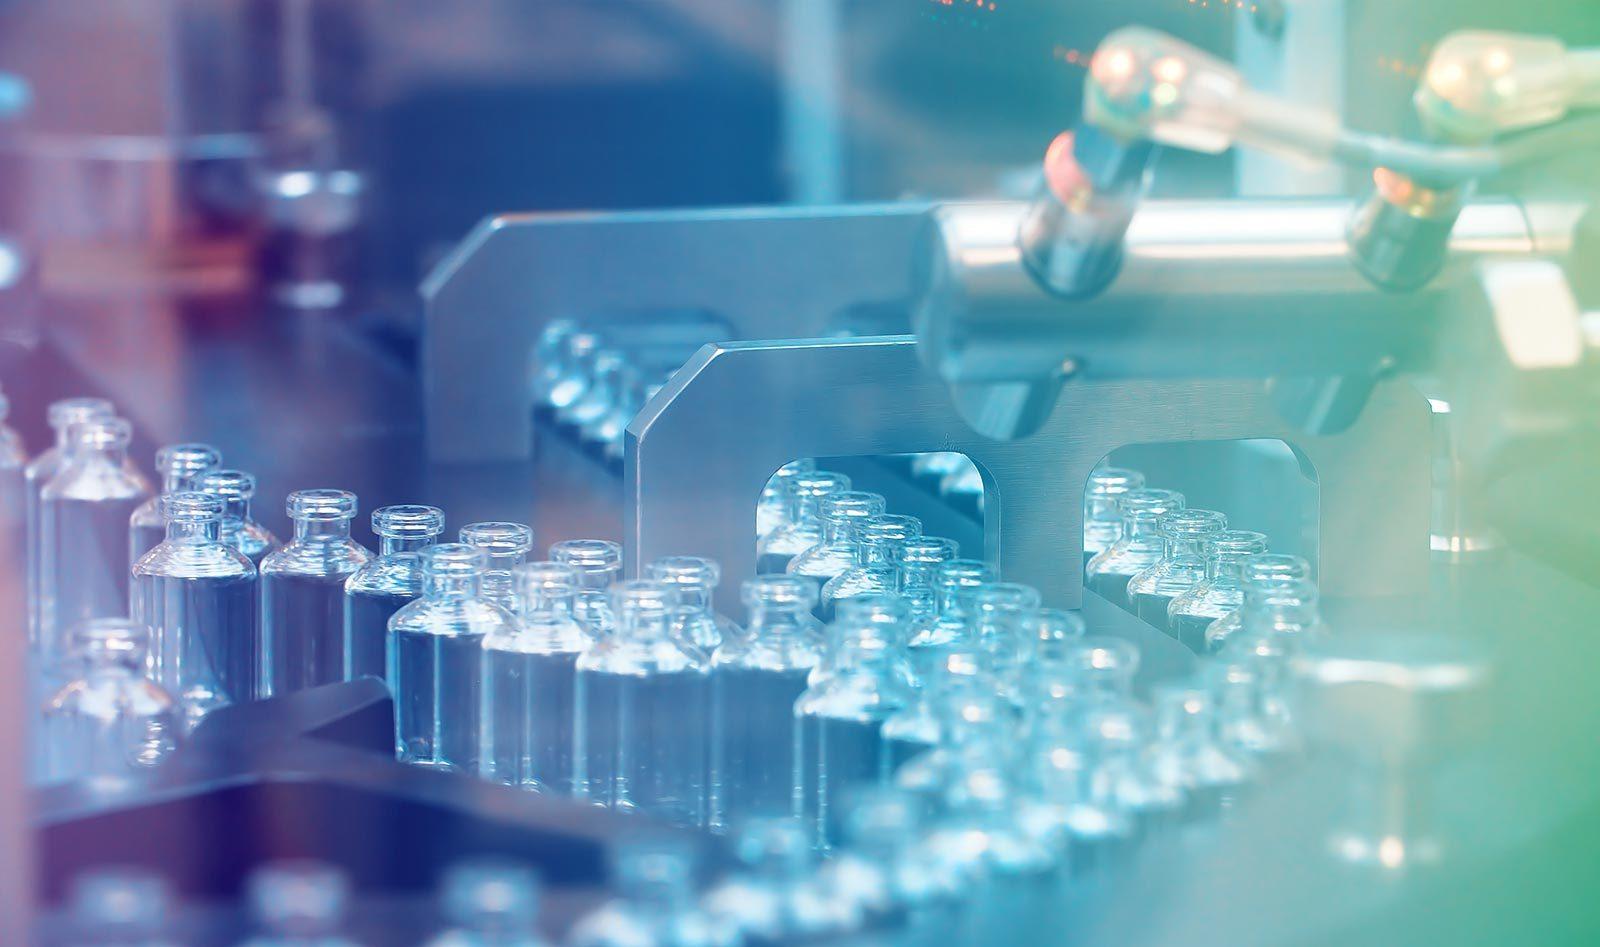 Pharma process Raman spectrometer